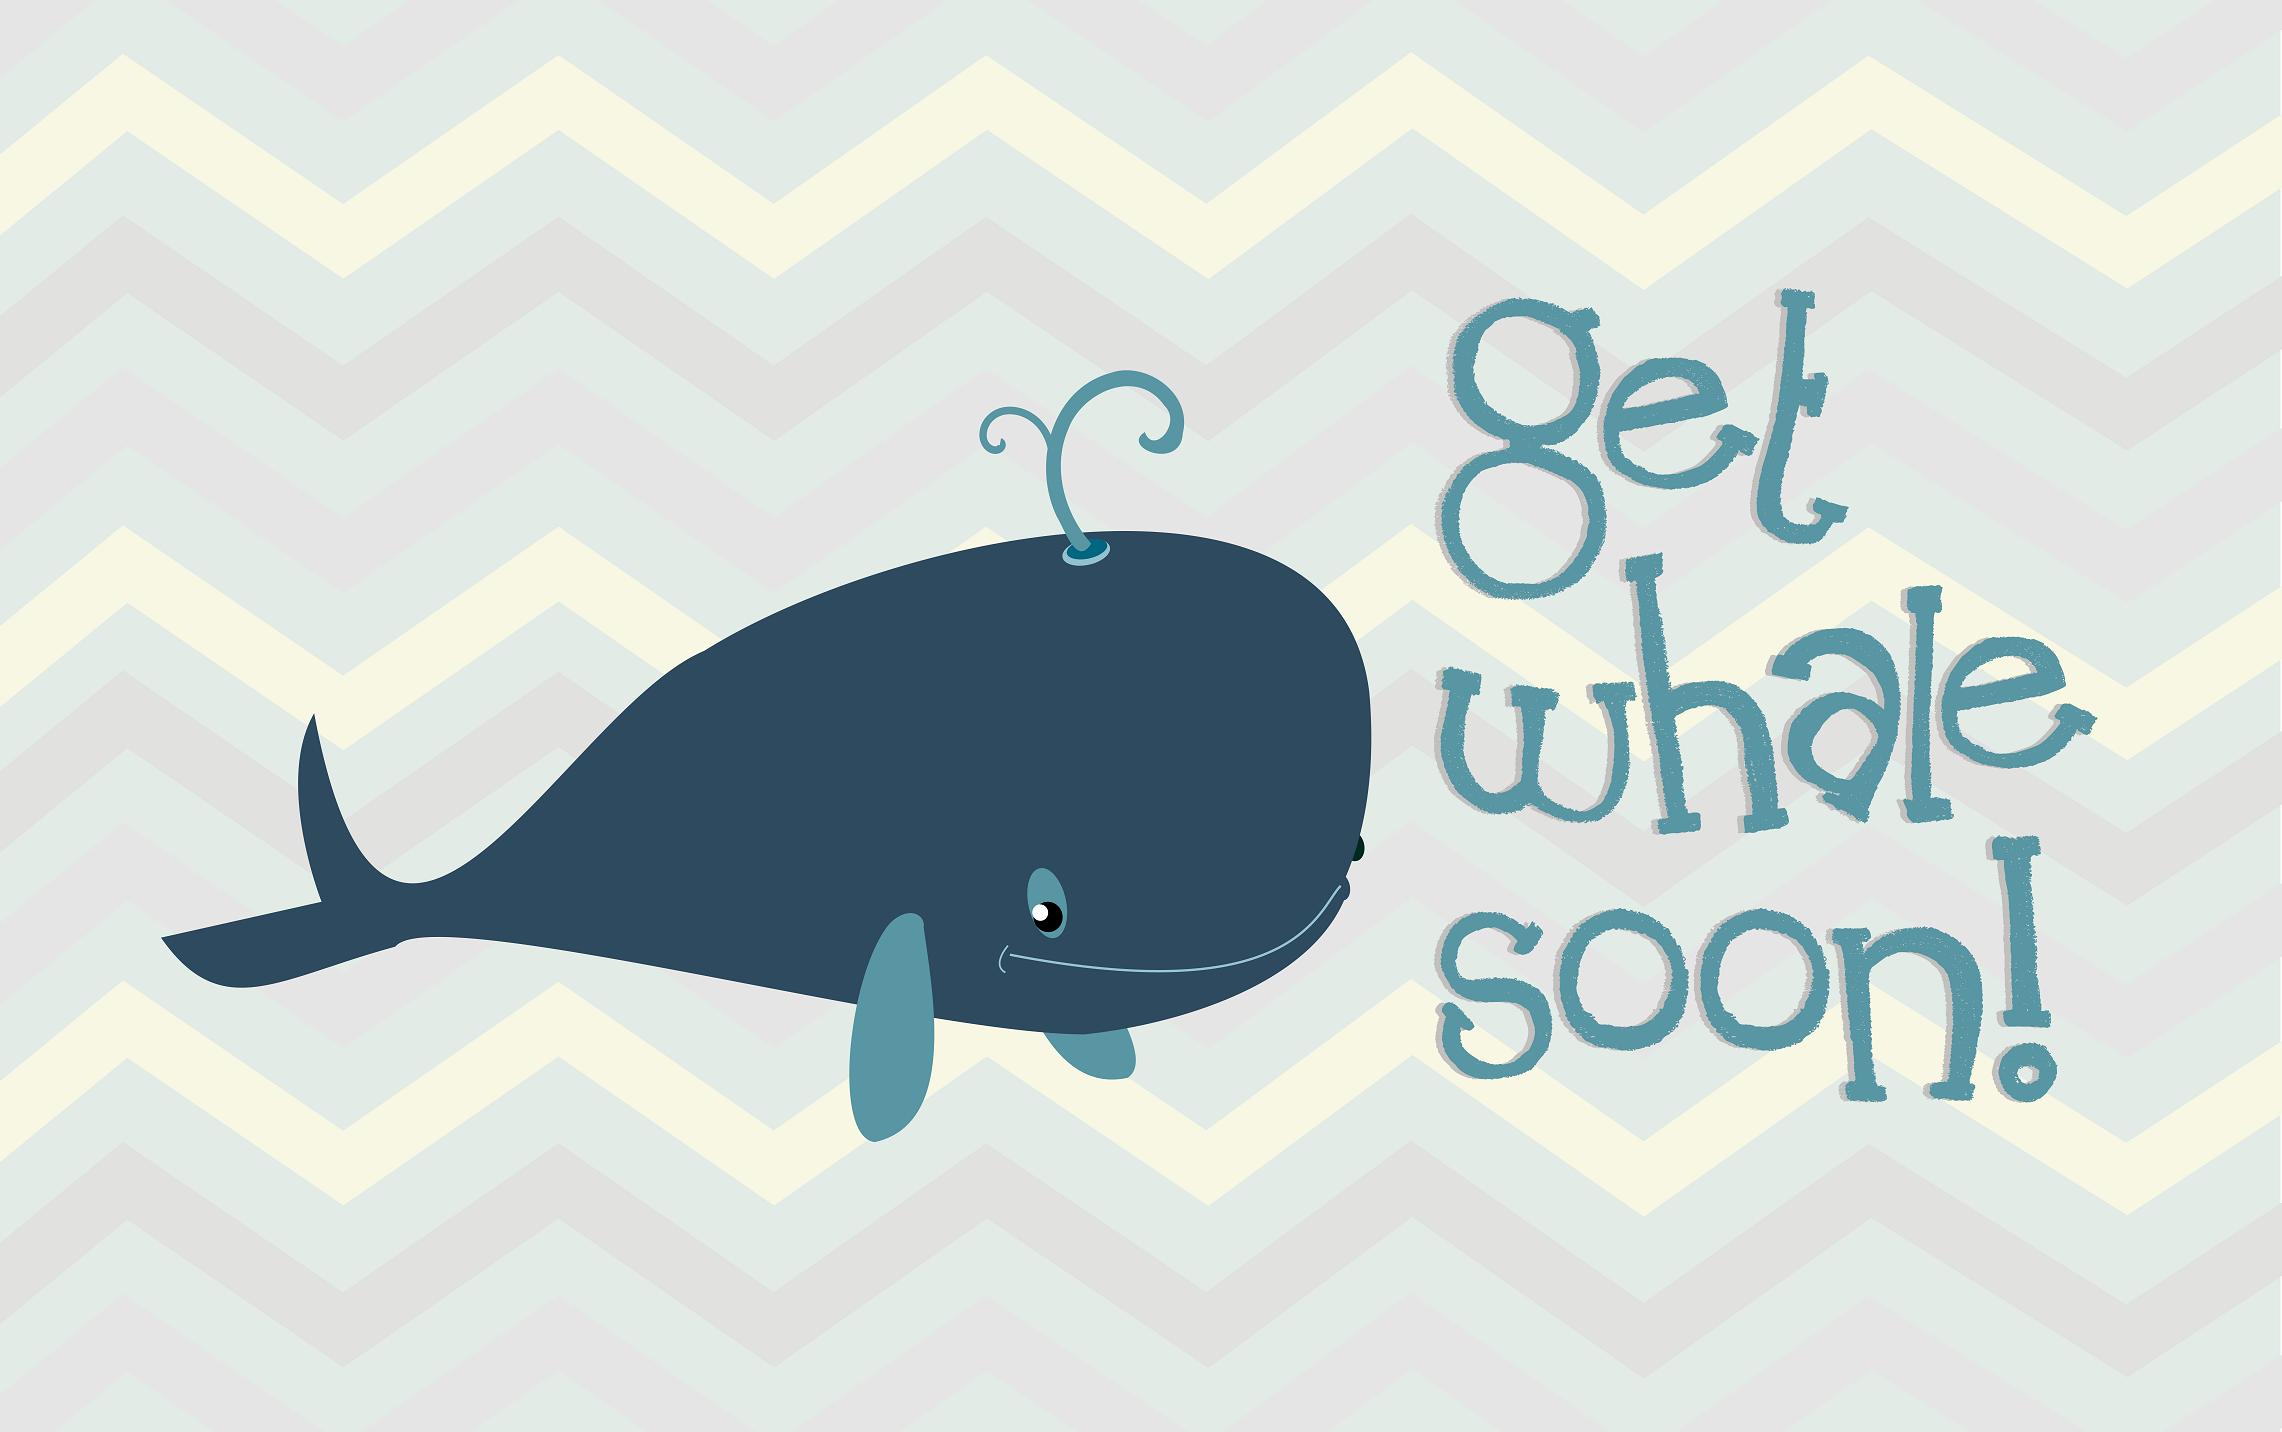 Get Whale Soon